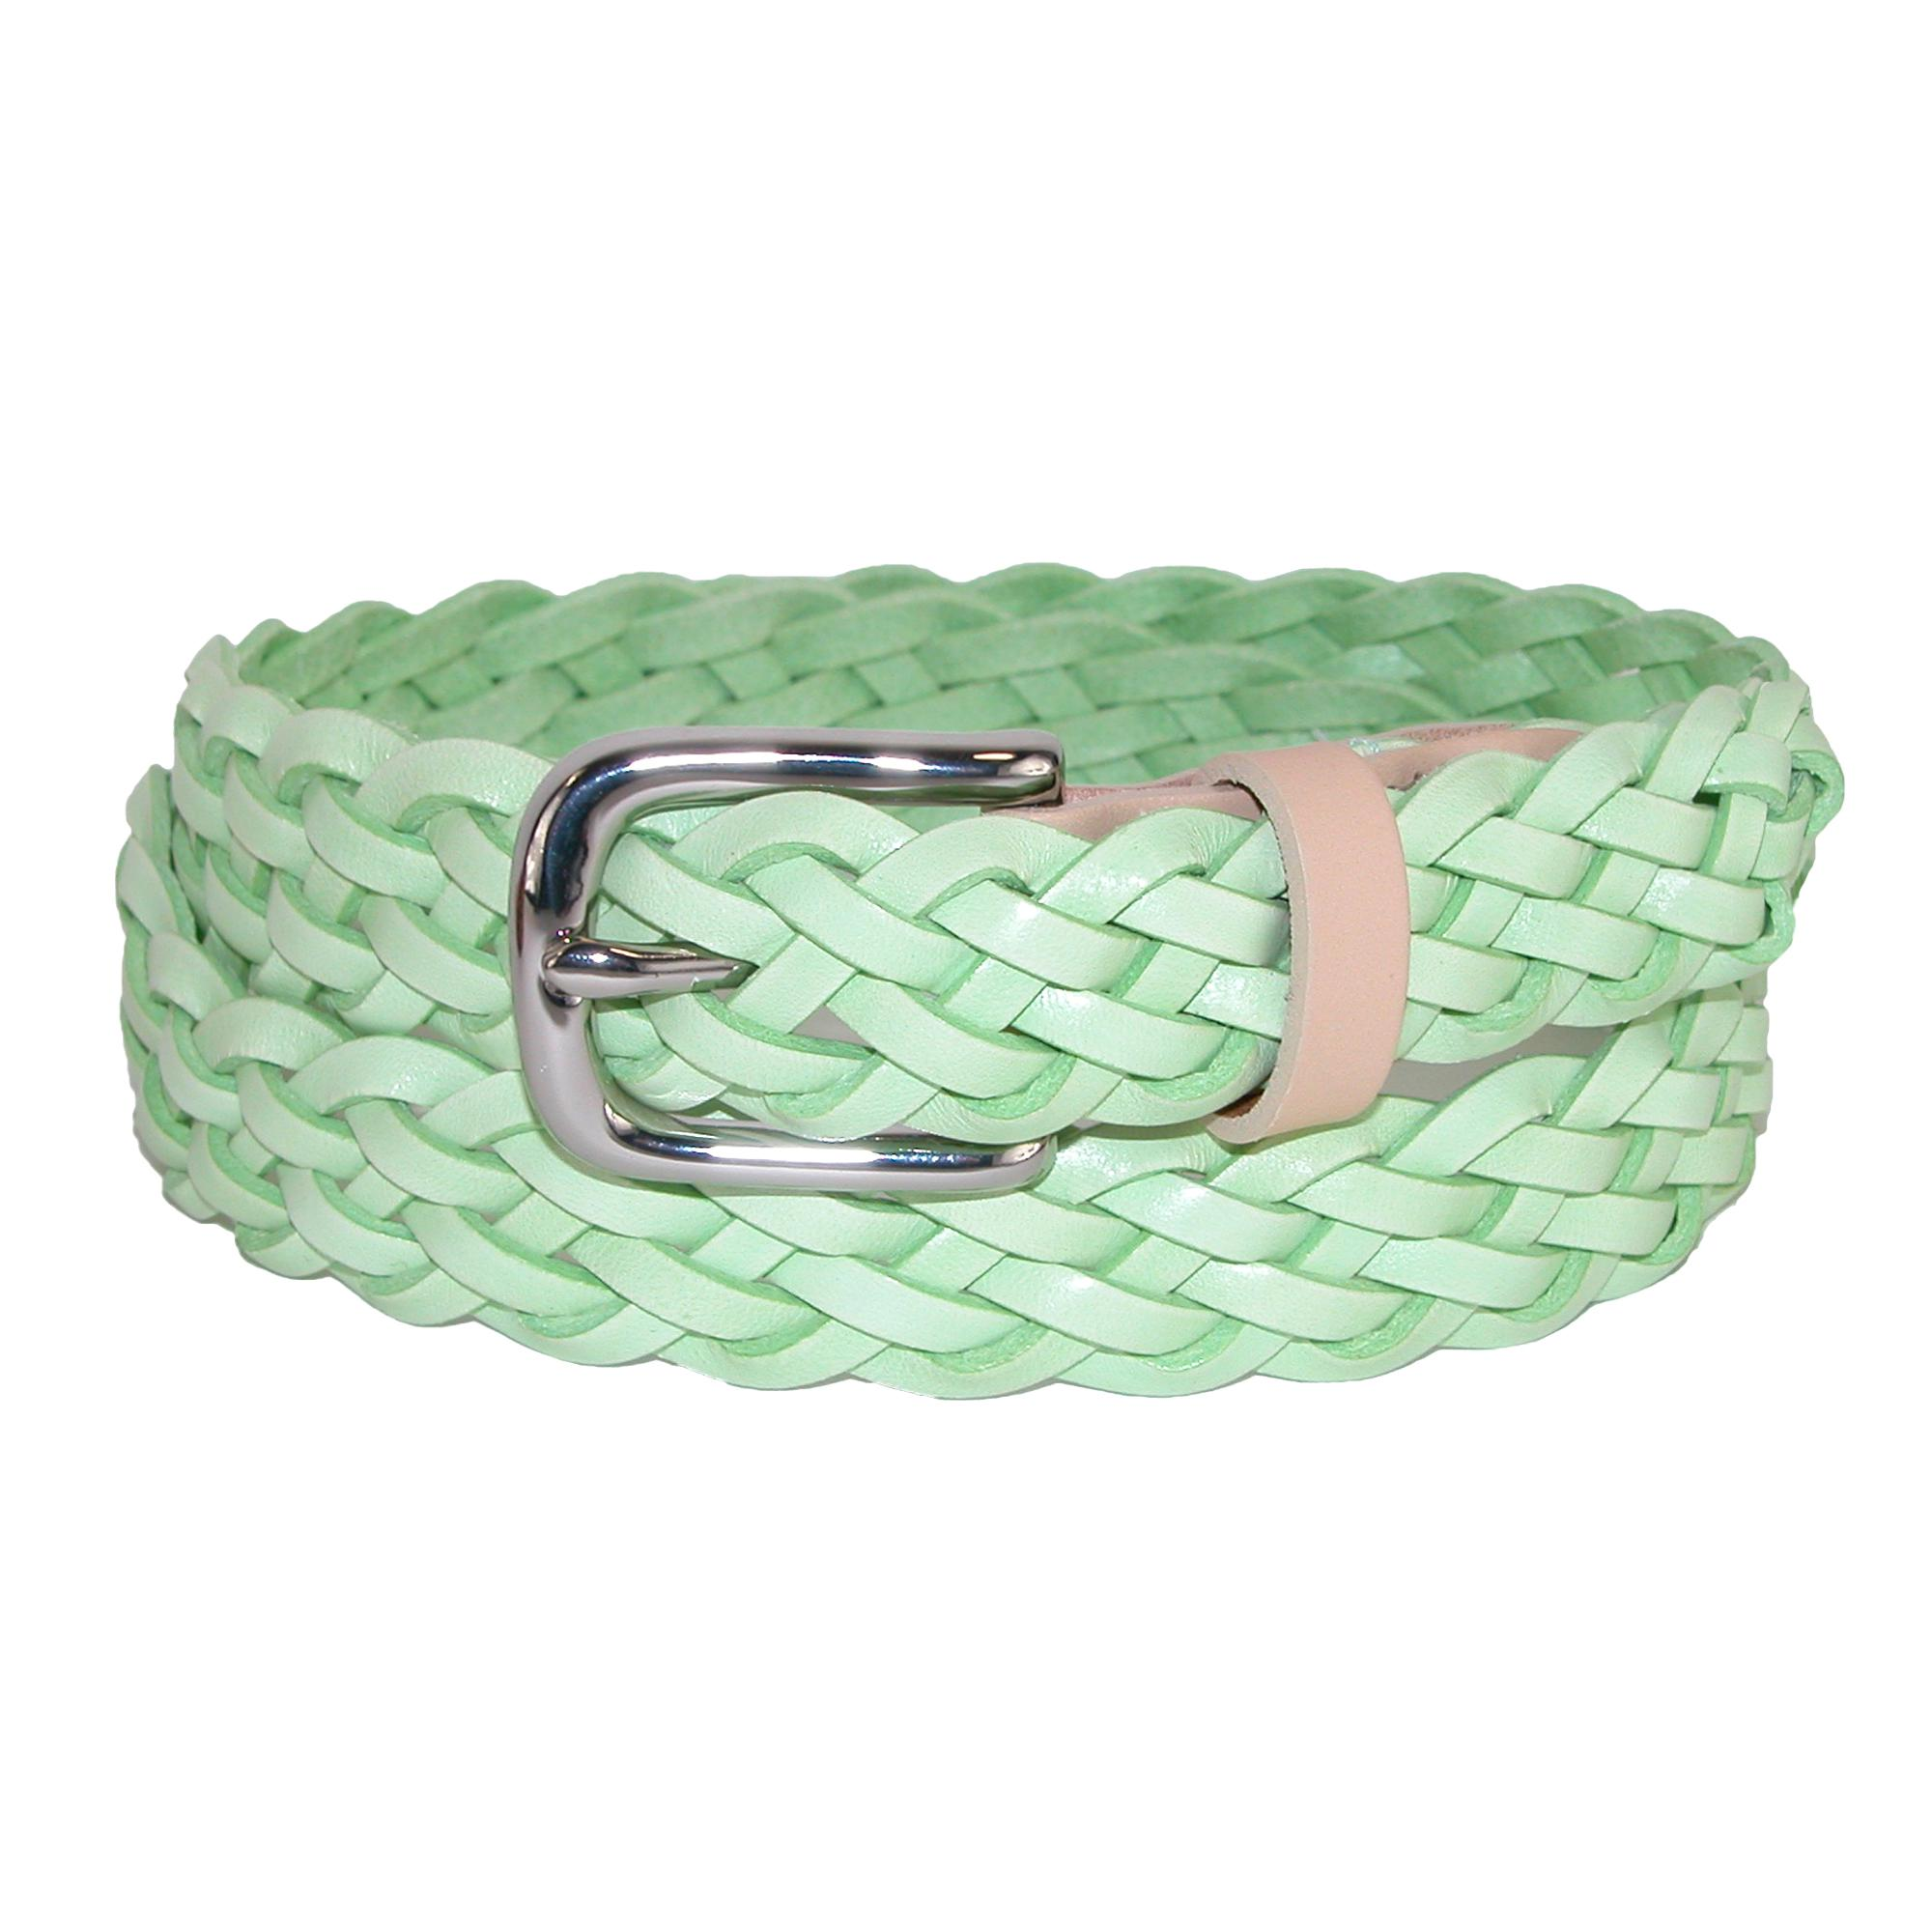 The British Belt Company Womens Prunella Leather Hand Woven Braided Belt